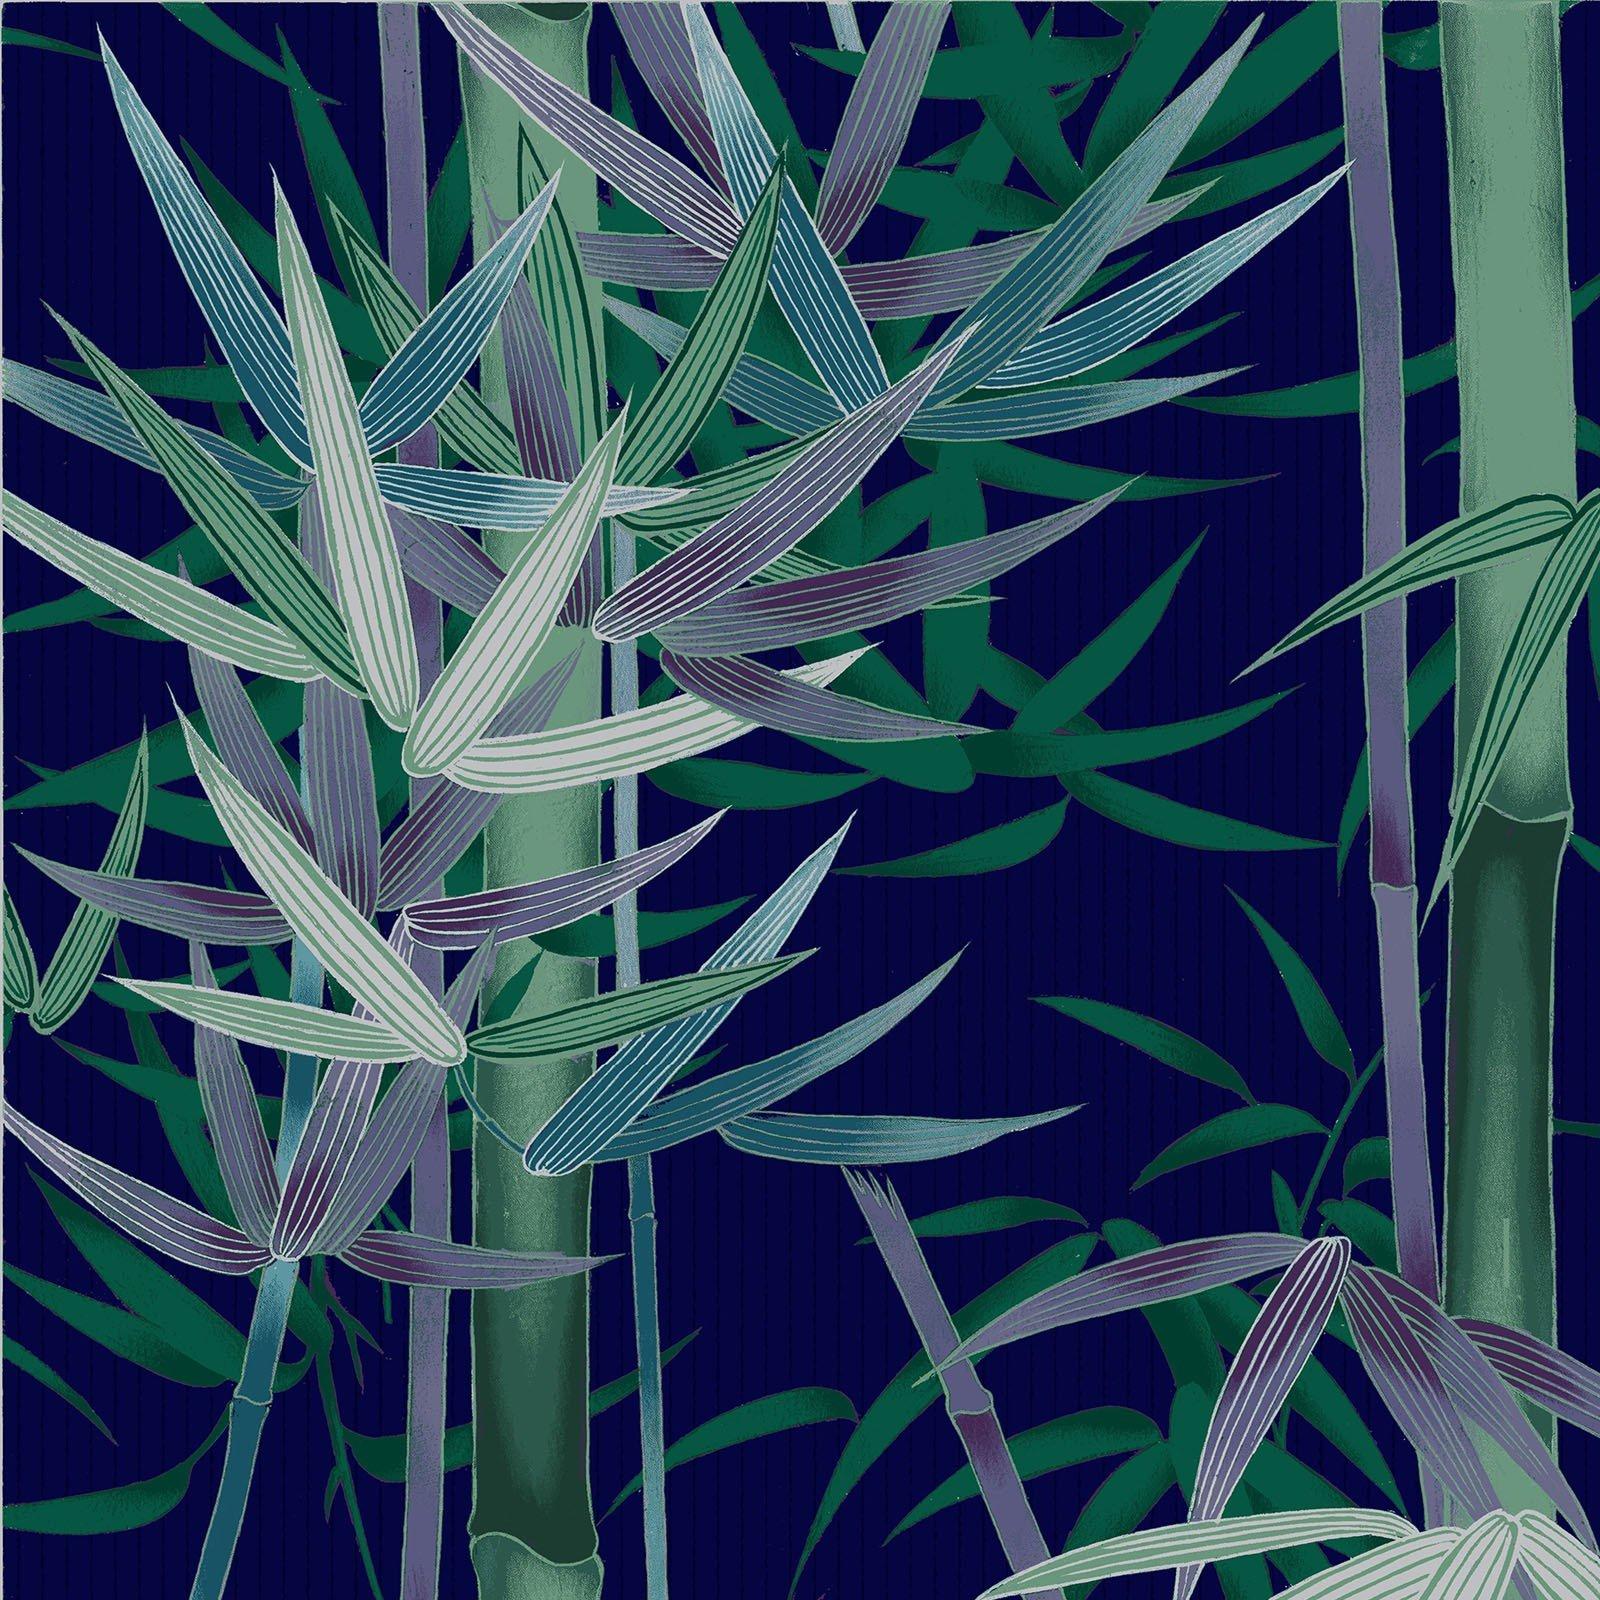 Bamboo - Nautical Silver Metallic<br/>Quilt Gate